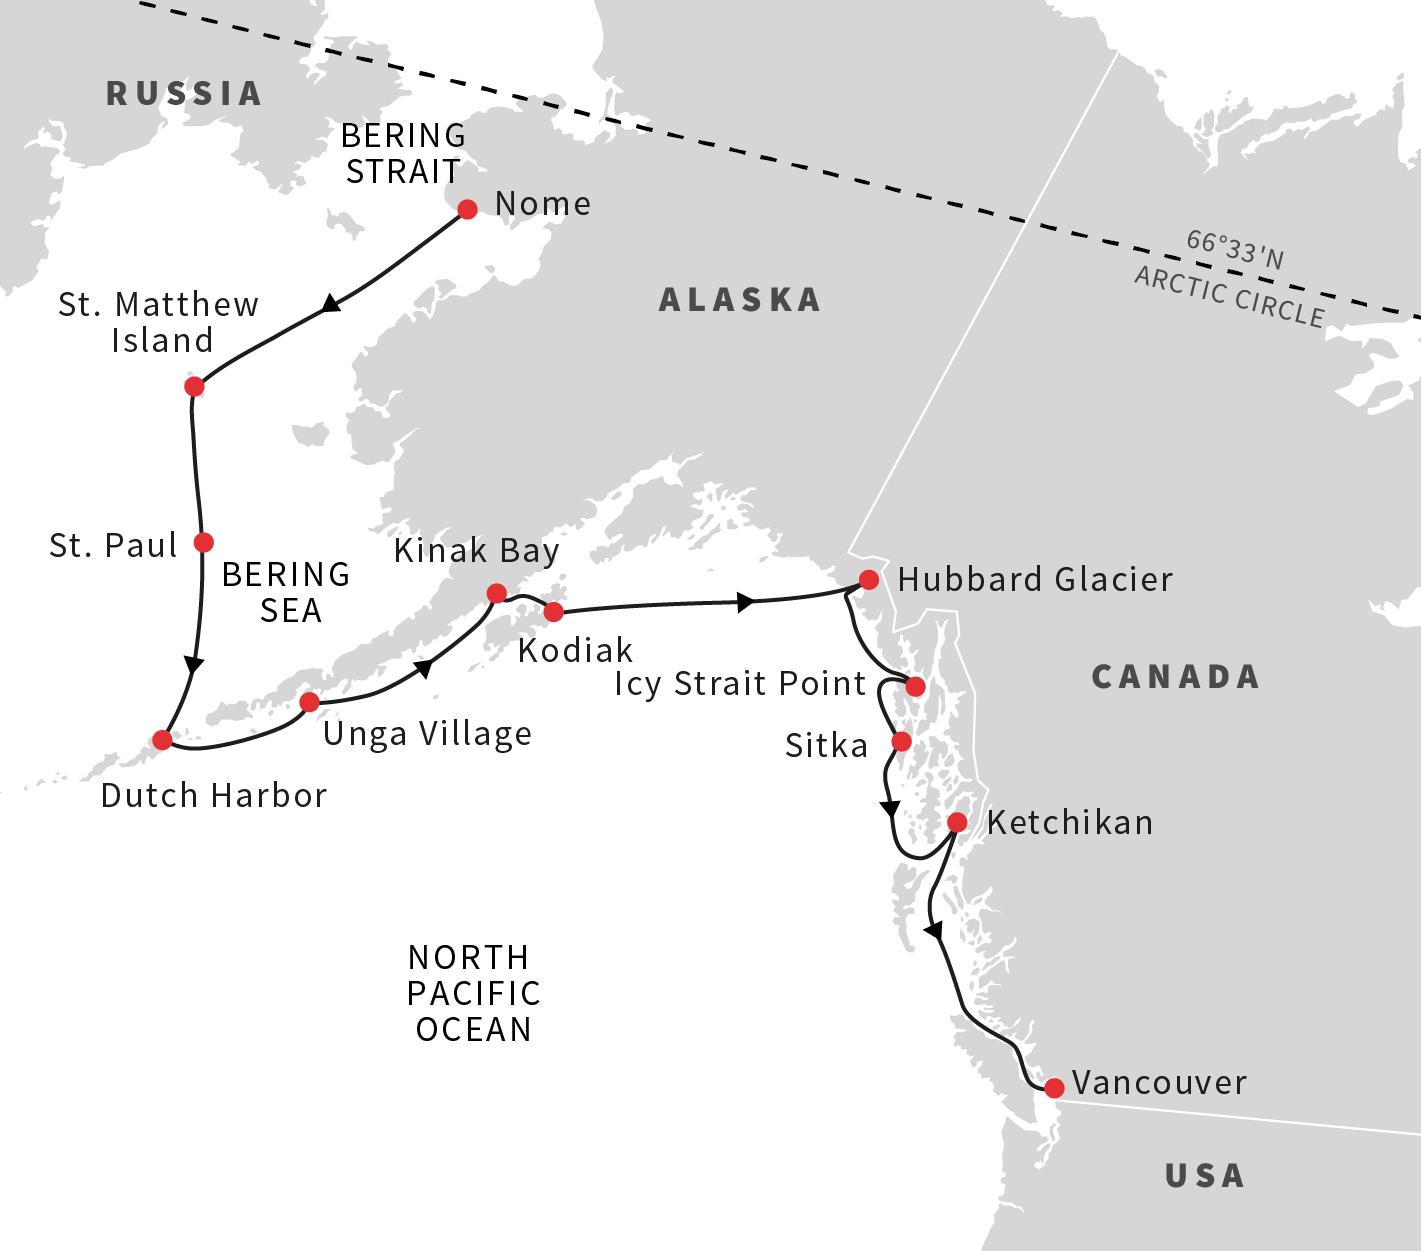 Fox Island Alaska Map.Cruise To Alaska And Canada The Aleutian Islands And Brown Bears